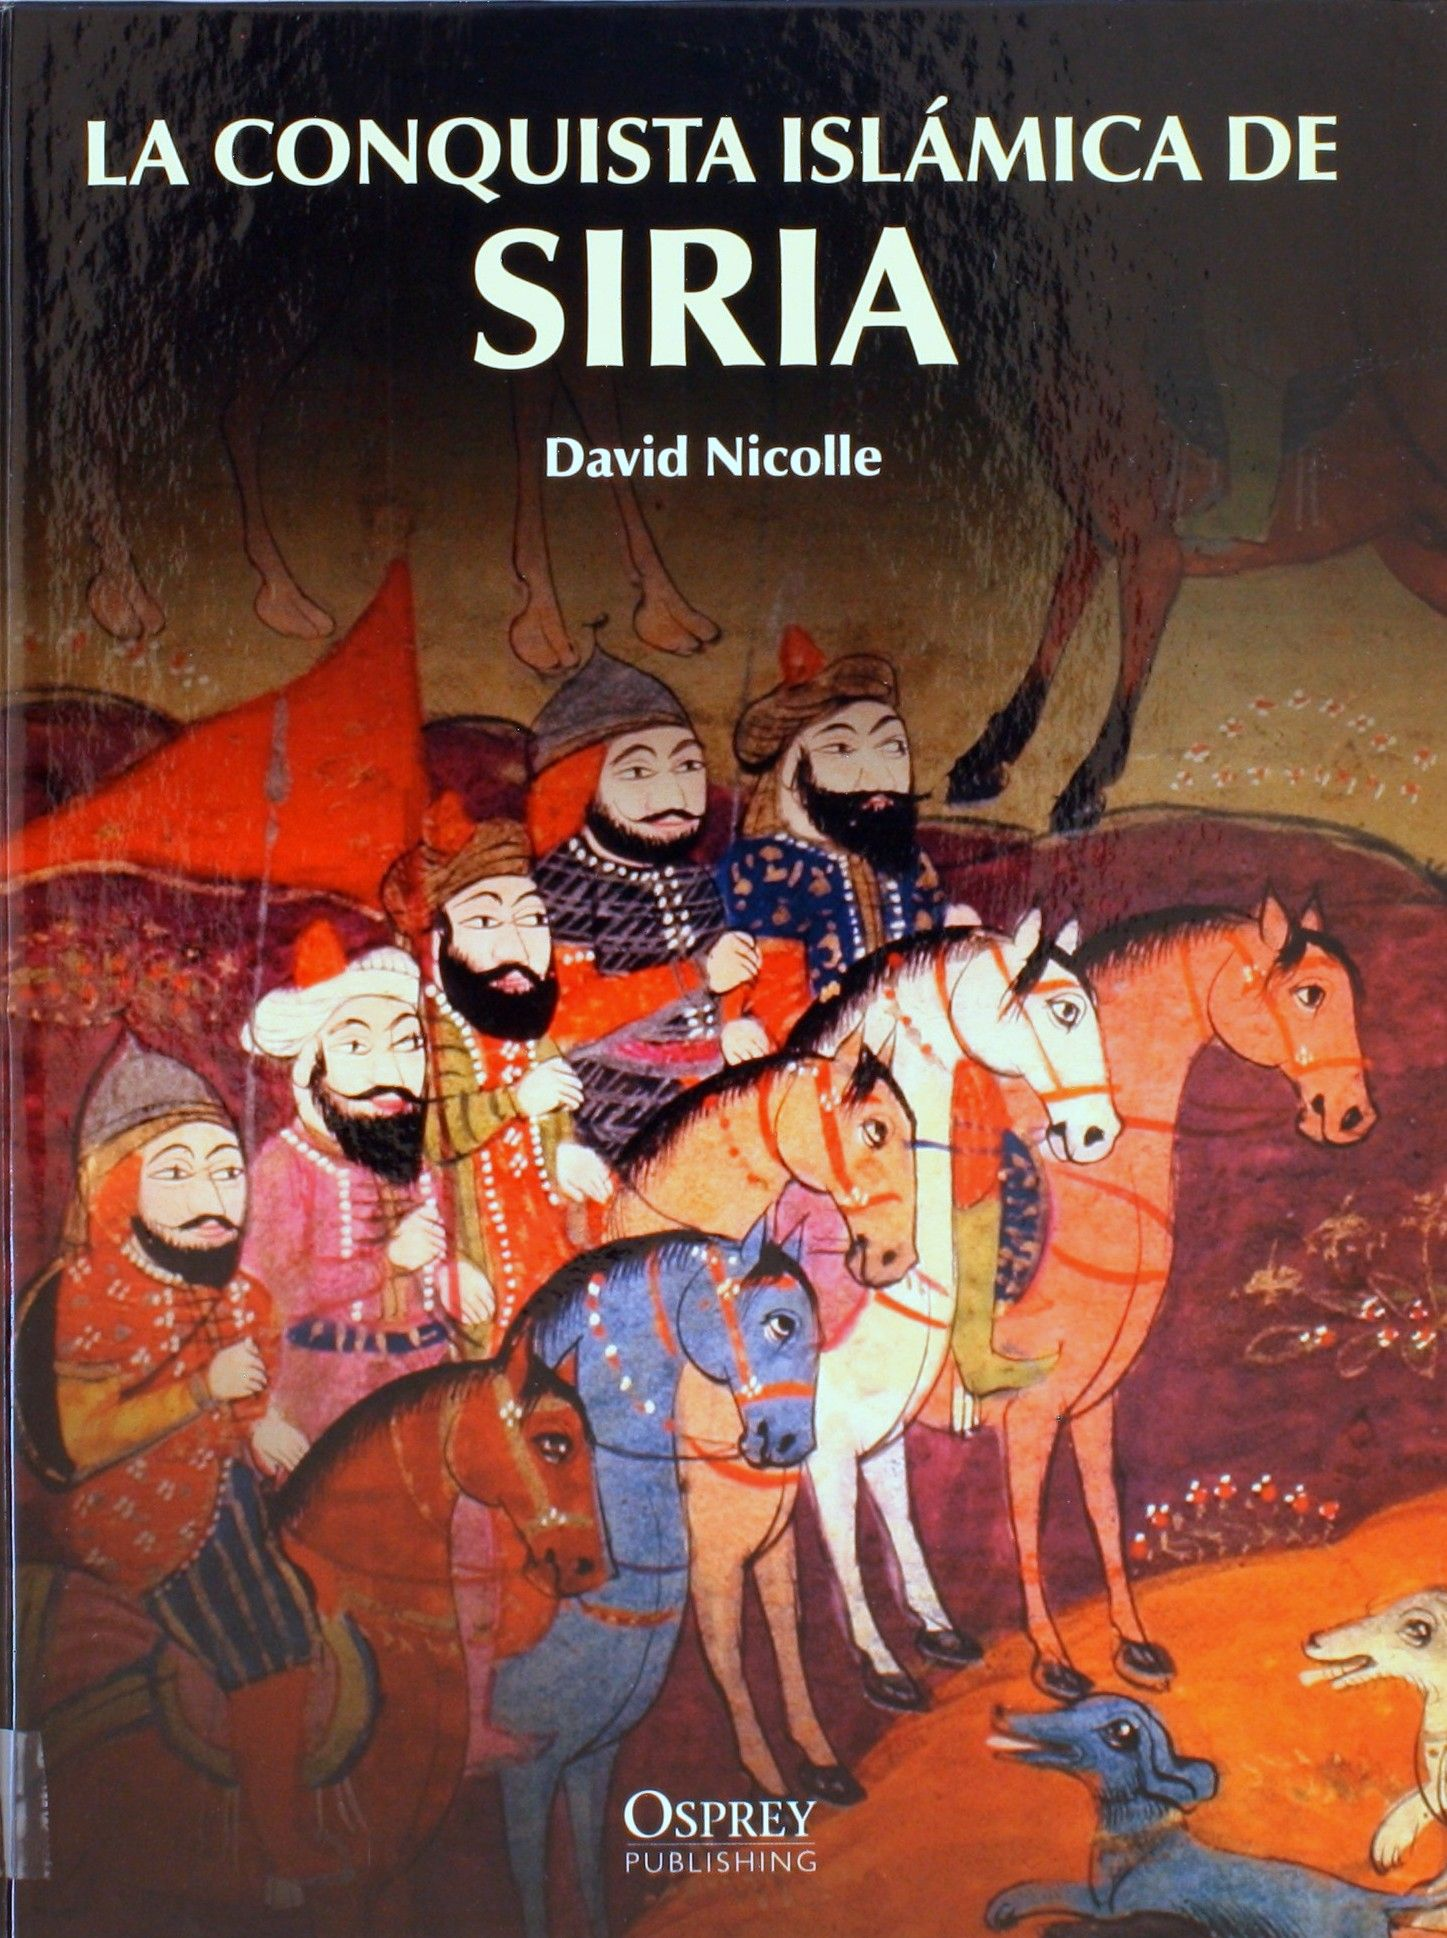 La conquista islámica de Siria, 2011   http://absysnet.bbtk.ull.es/cgi-bin/abnetopac01?TITN=504224